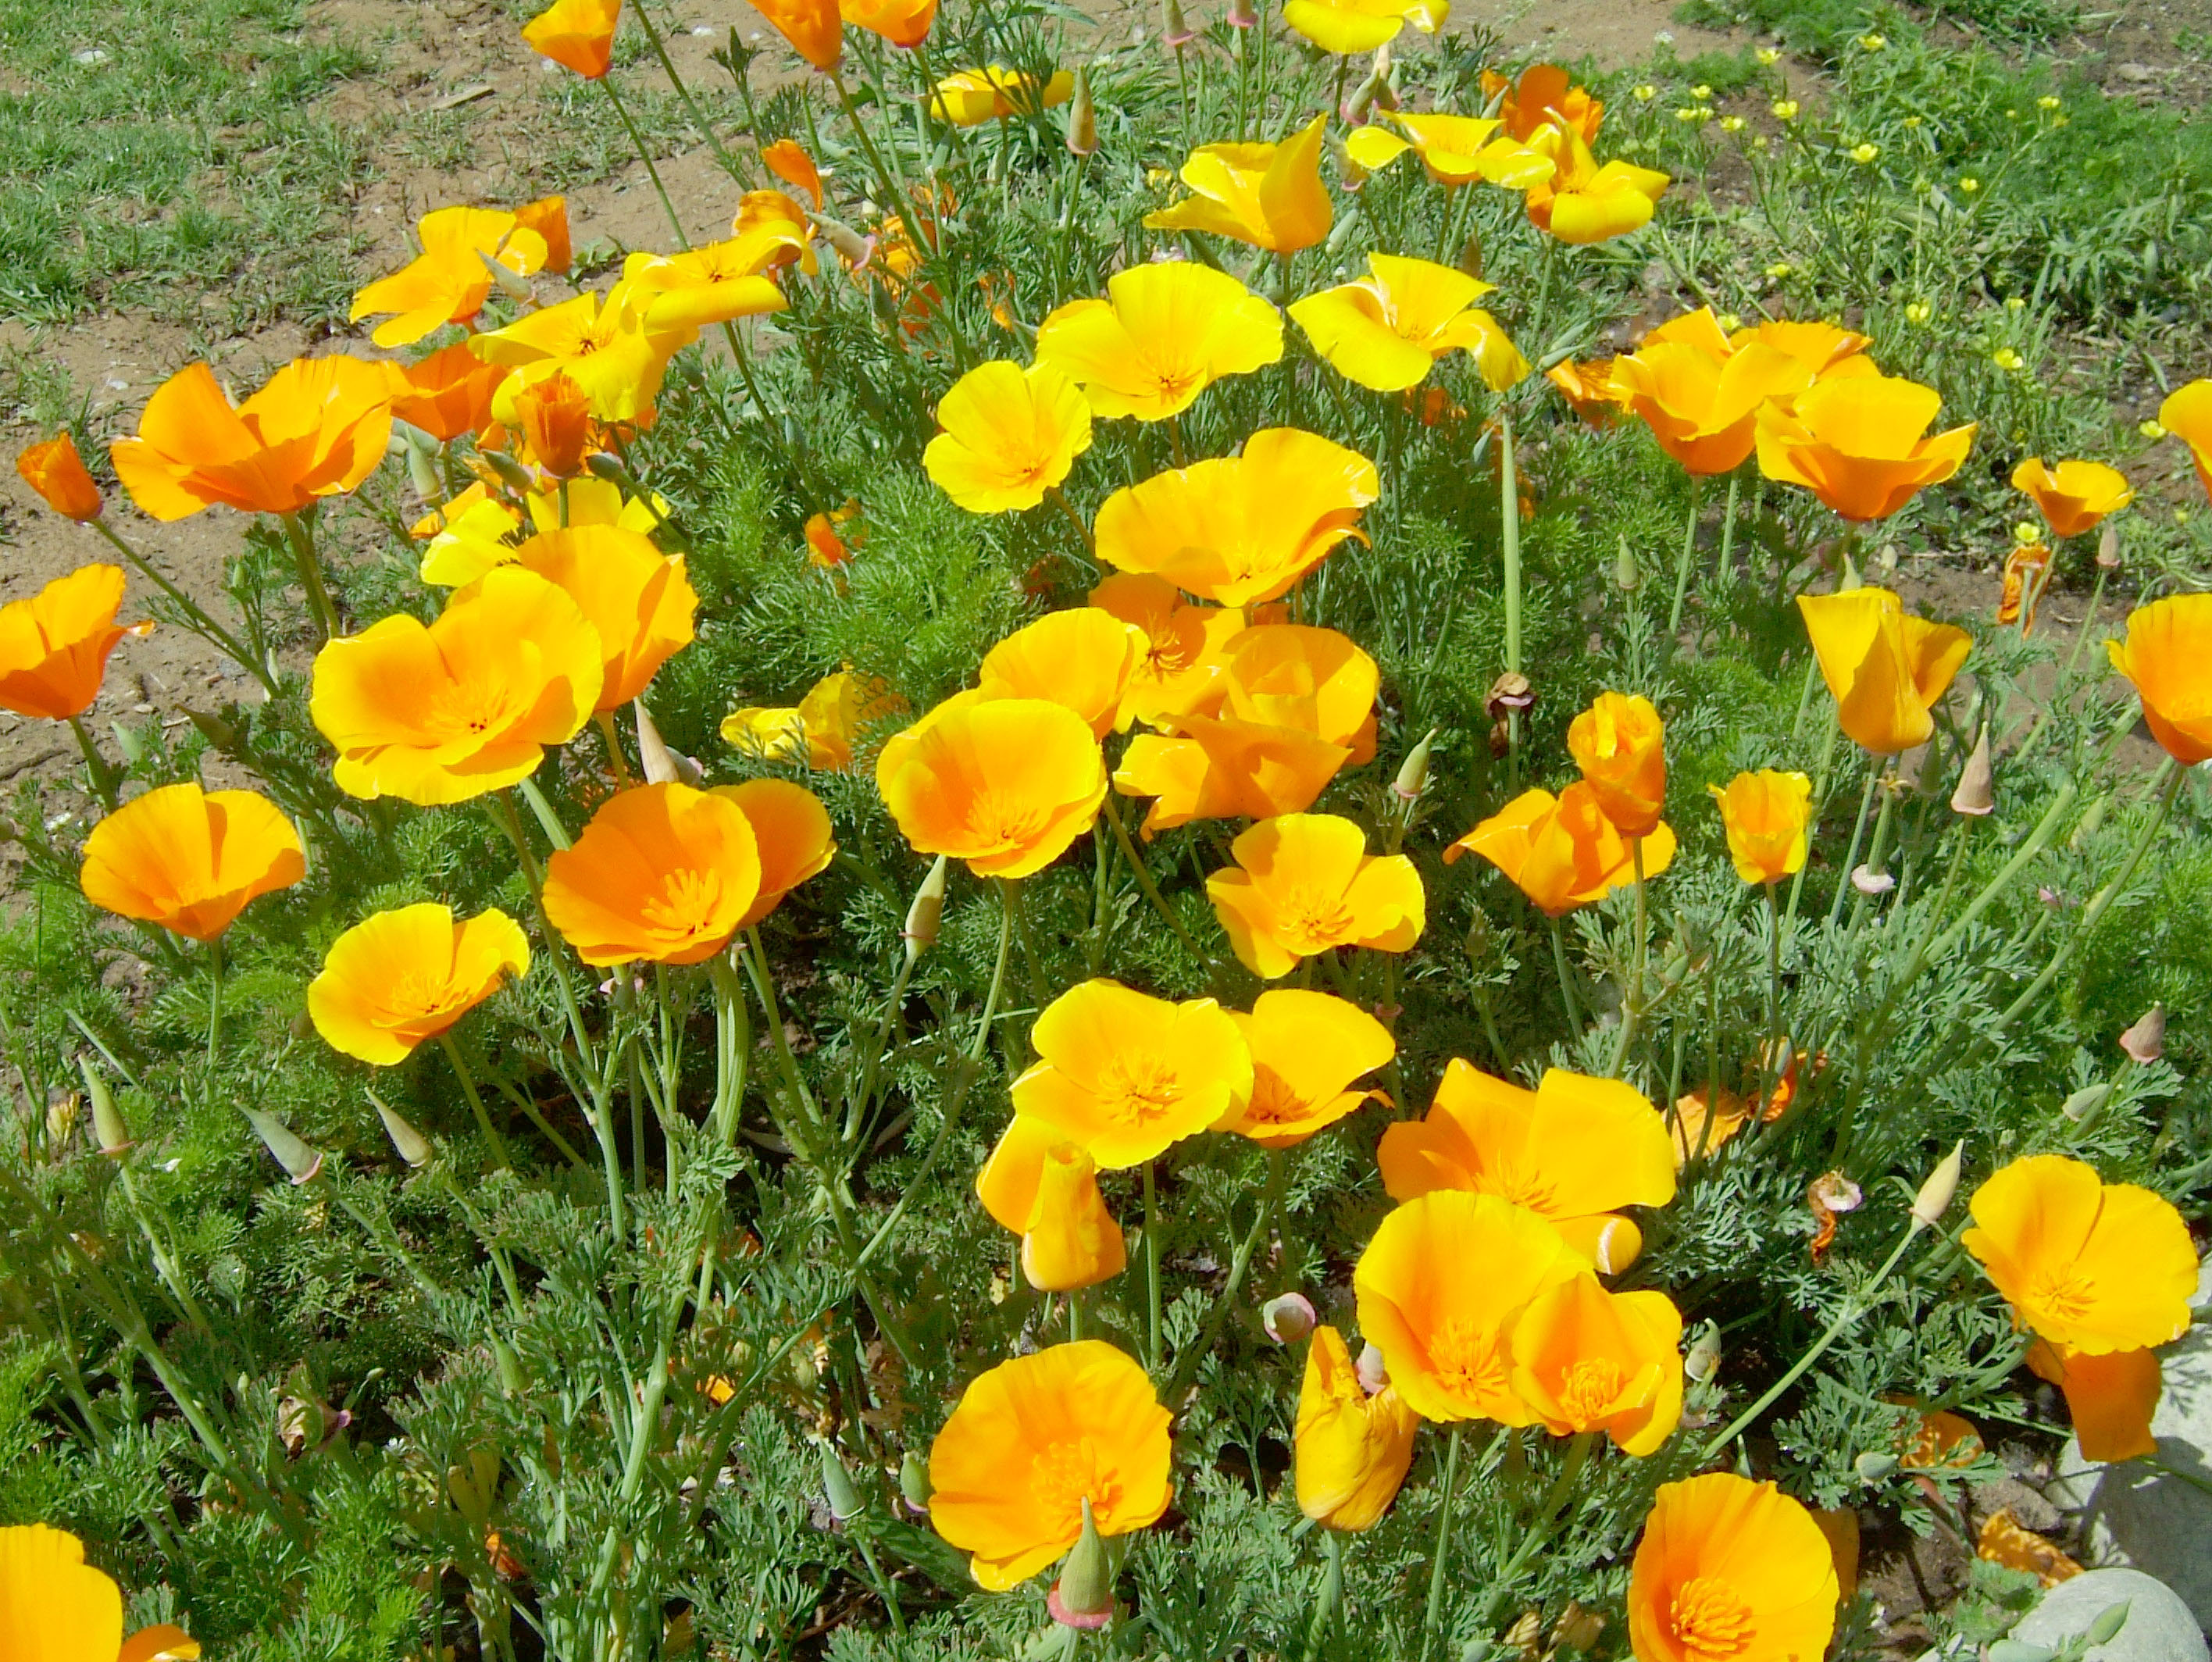 Asisbiz local wild spring flowers srinagar kashmir india 02 local wild spring flowers srinagar kashmir india 02 mightylinksfo